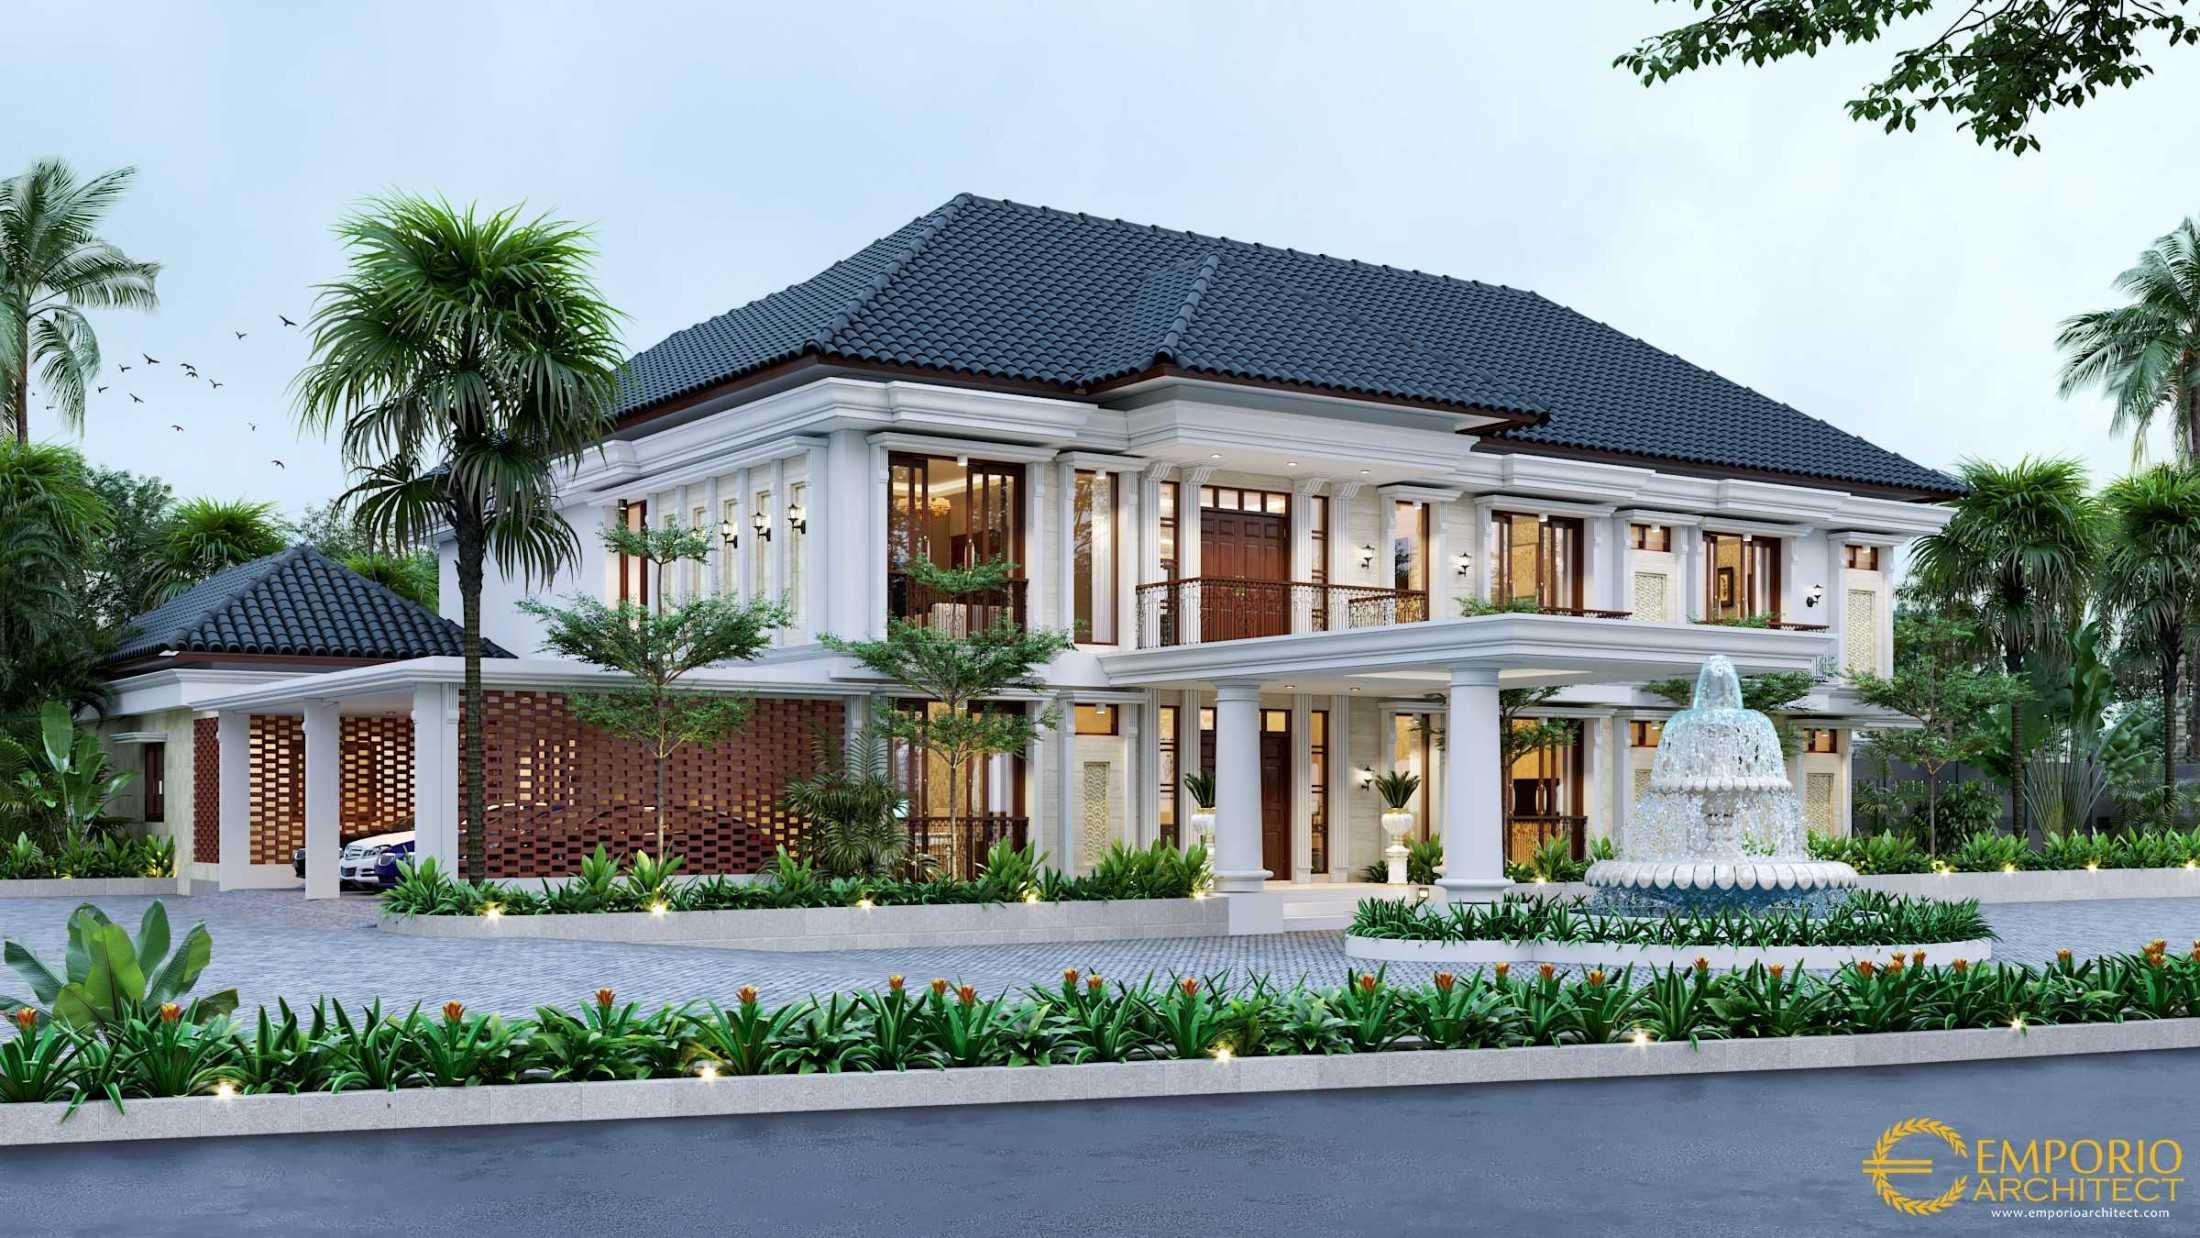 Emporio Architect di Bangka Barat